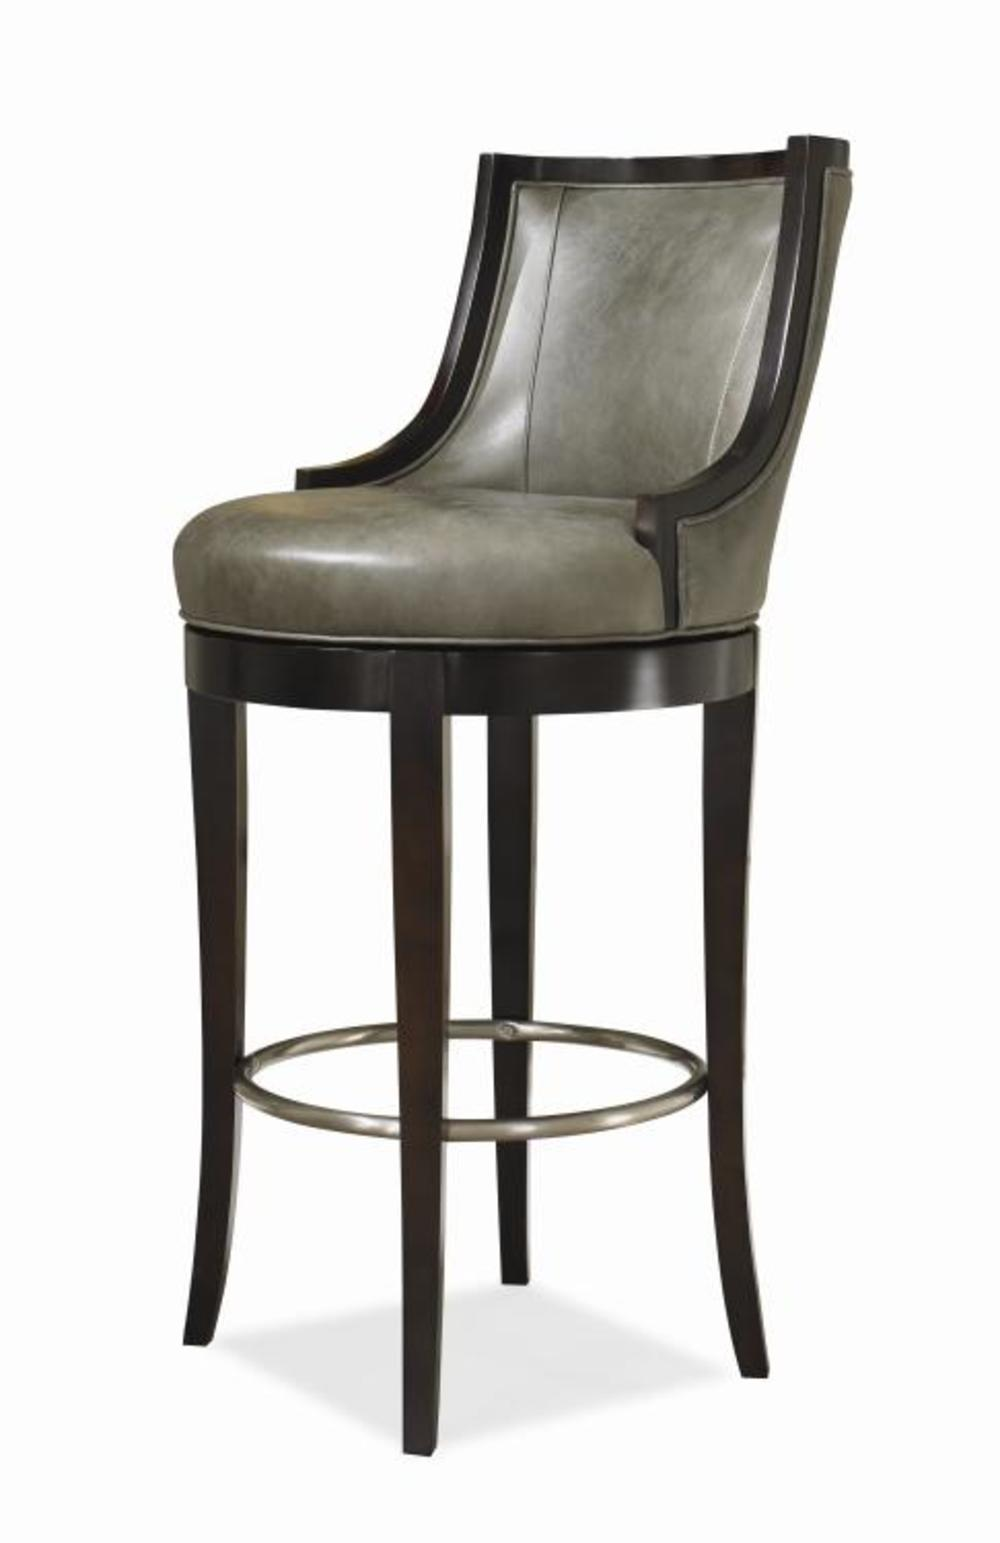 Century Furniture - Taylor Swivel Bar Stool